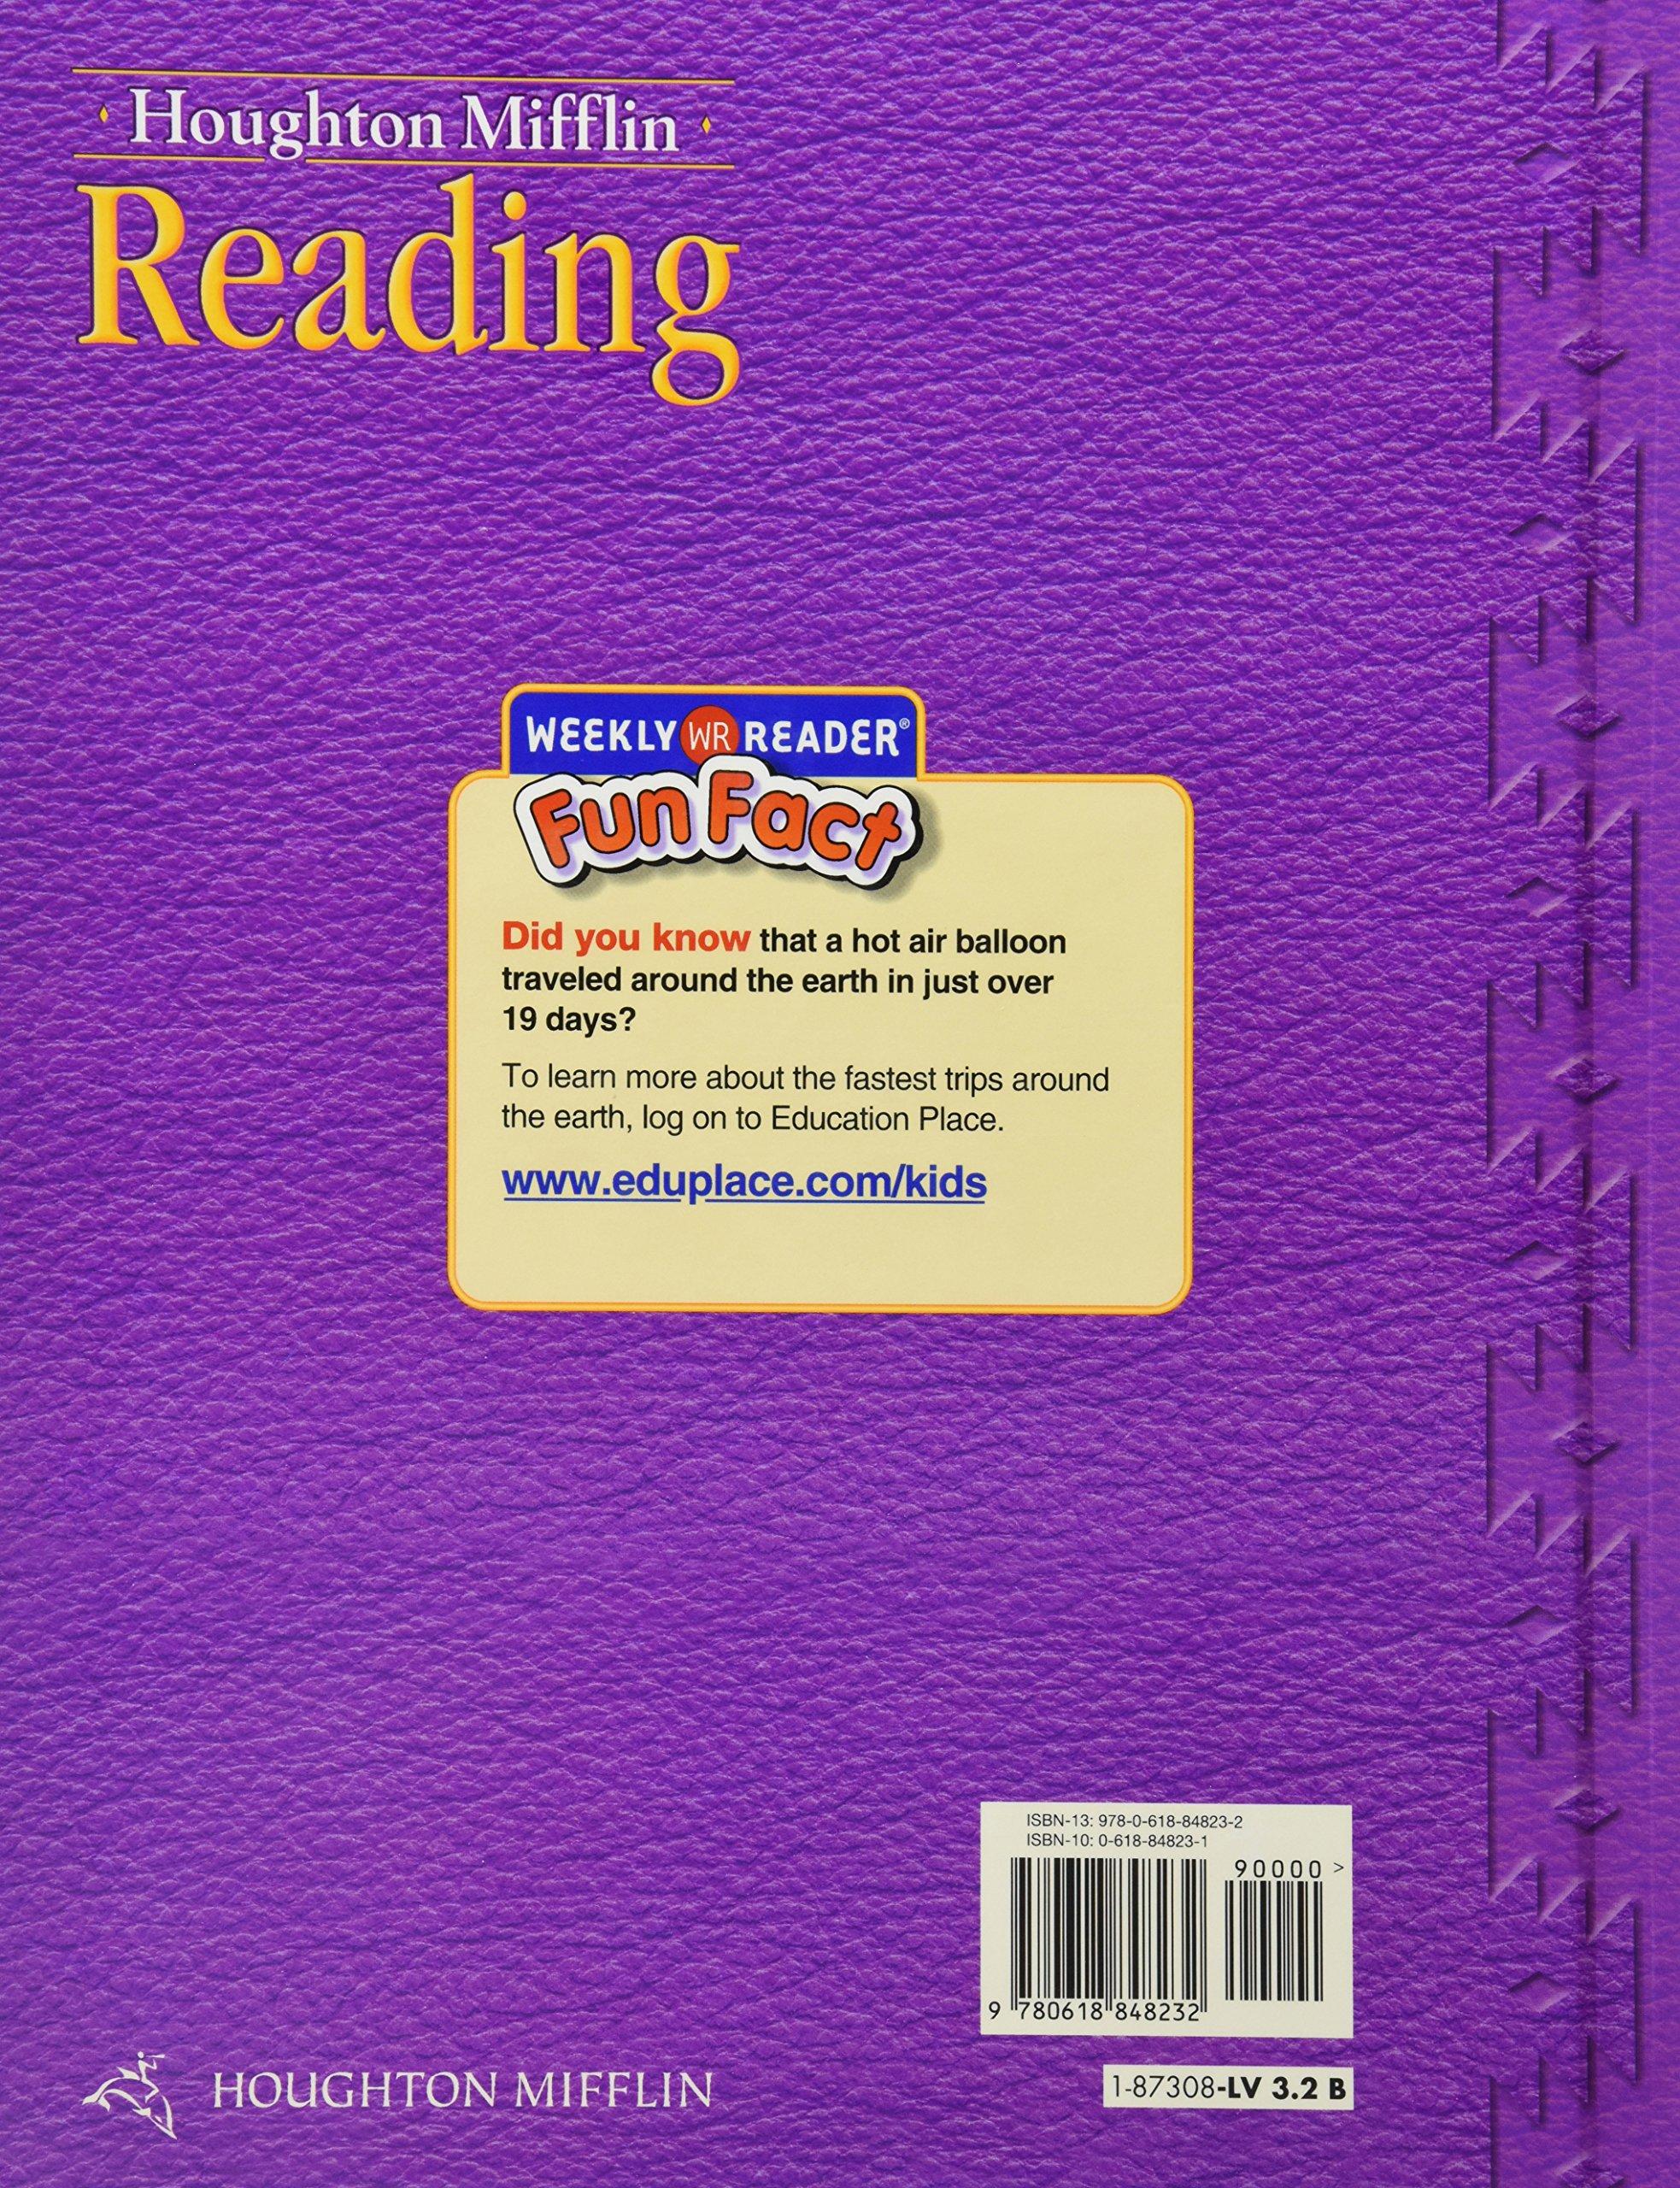 Amazon.com: Reading Horizons 3 2 (Houghton Mifflin Reading)  (9780618848232): HOUGHTON MIFFLIN: Books